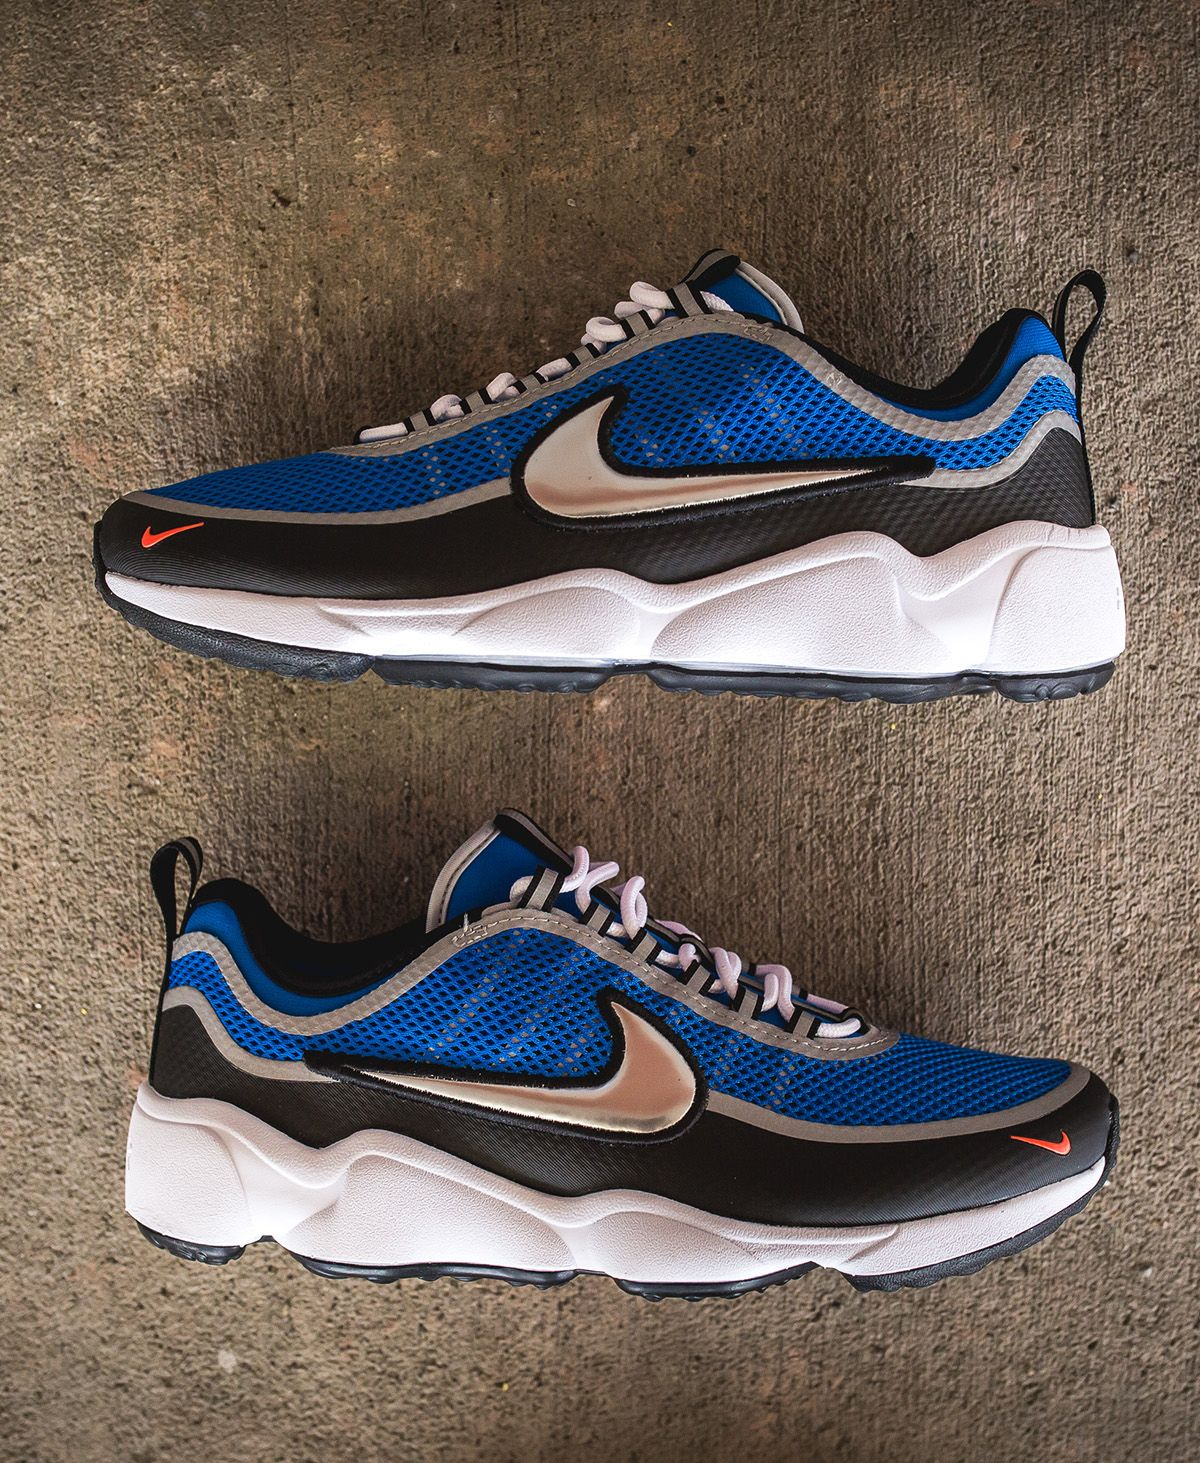 save off 2a67c 53bcb Nike Air Zoom Spiridon Ultra  Two Colorway Drops for April 2017 - EU Kicks  Sneaker  Magazine